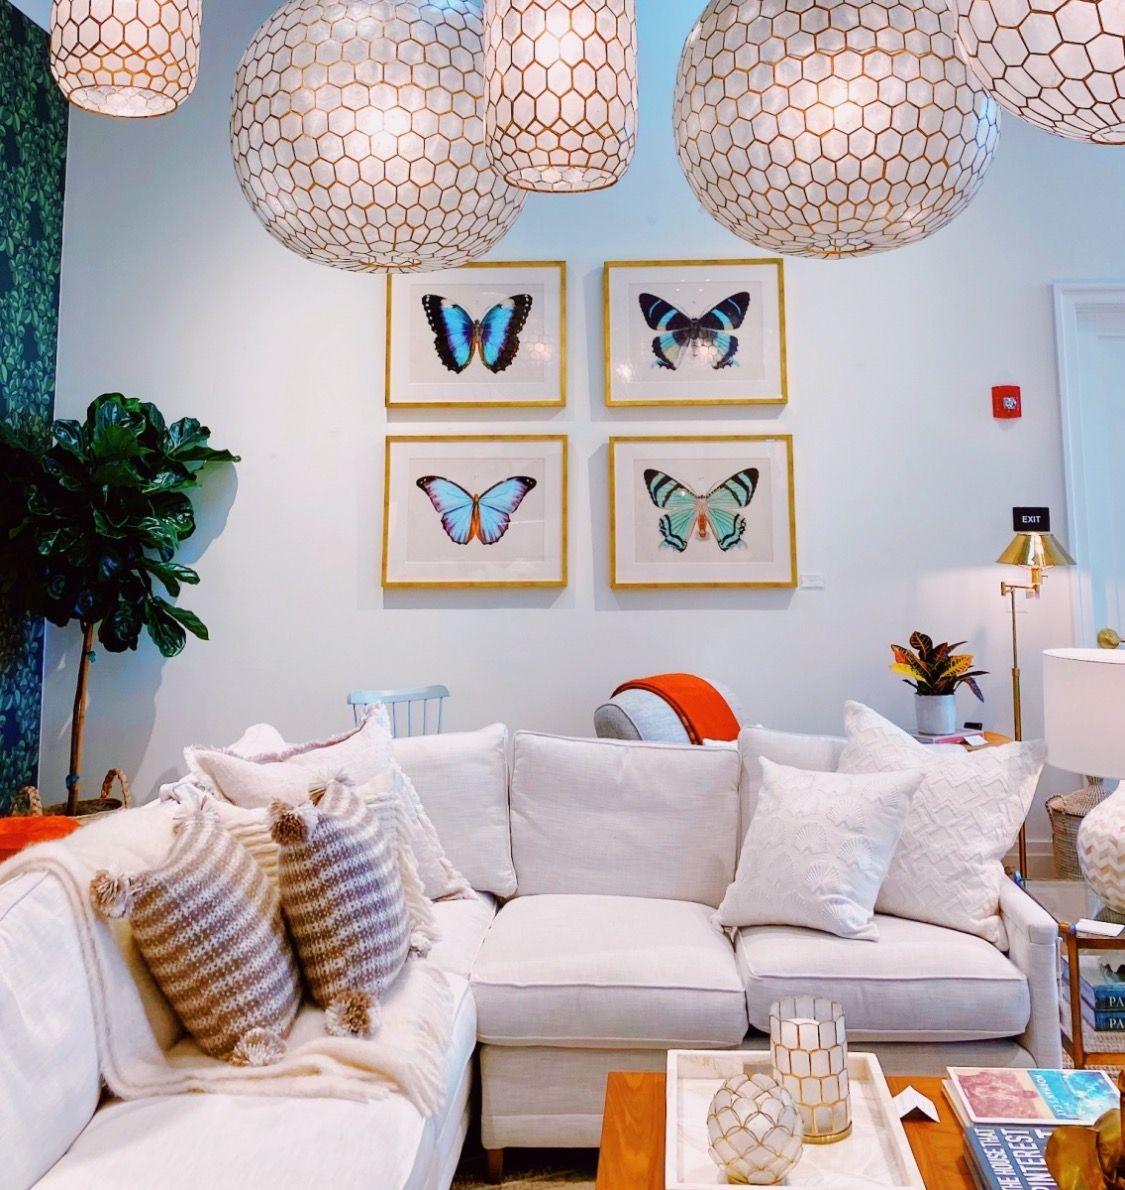 Pinterest Zoewro College Apartment Decor Preppy Living Room Home Bedroom College living room decor